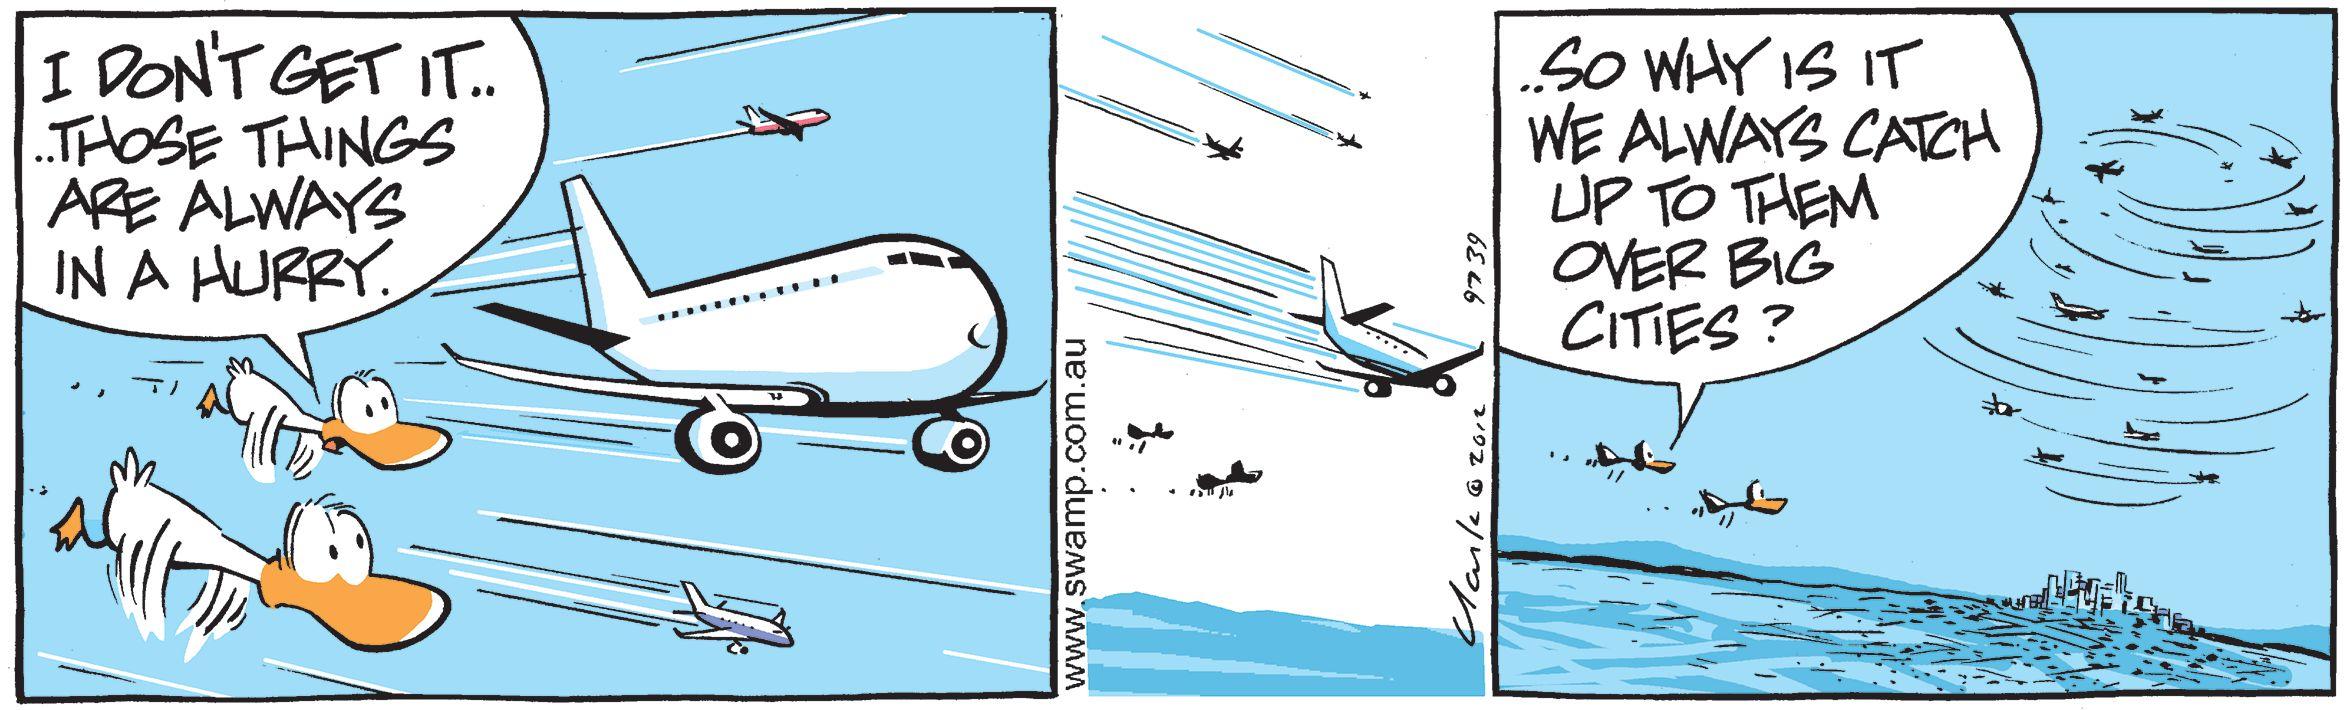 Aviator Ducks Overtaken By Jets